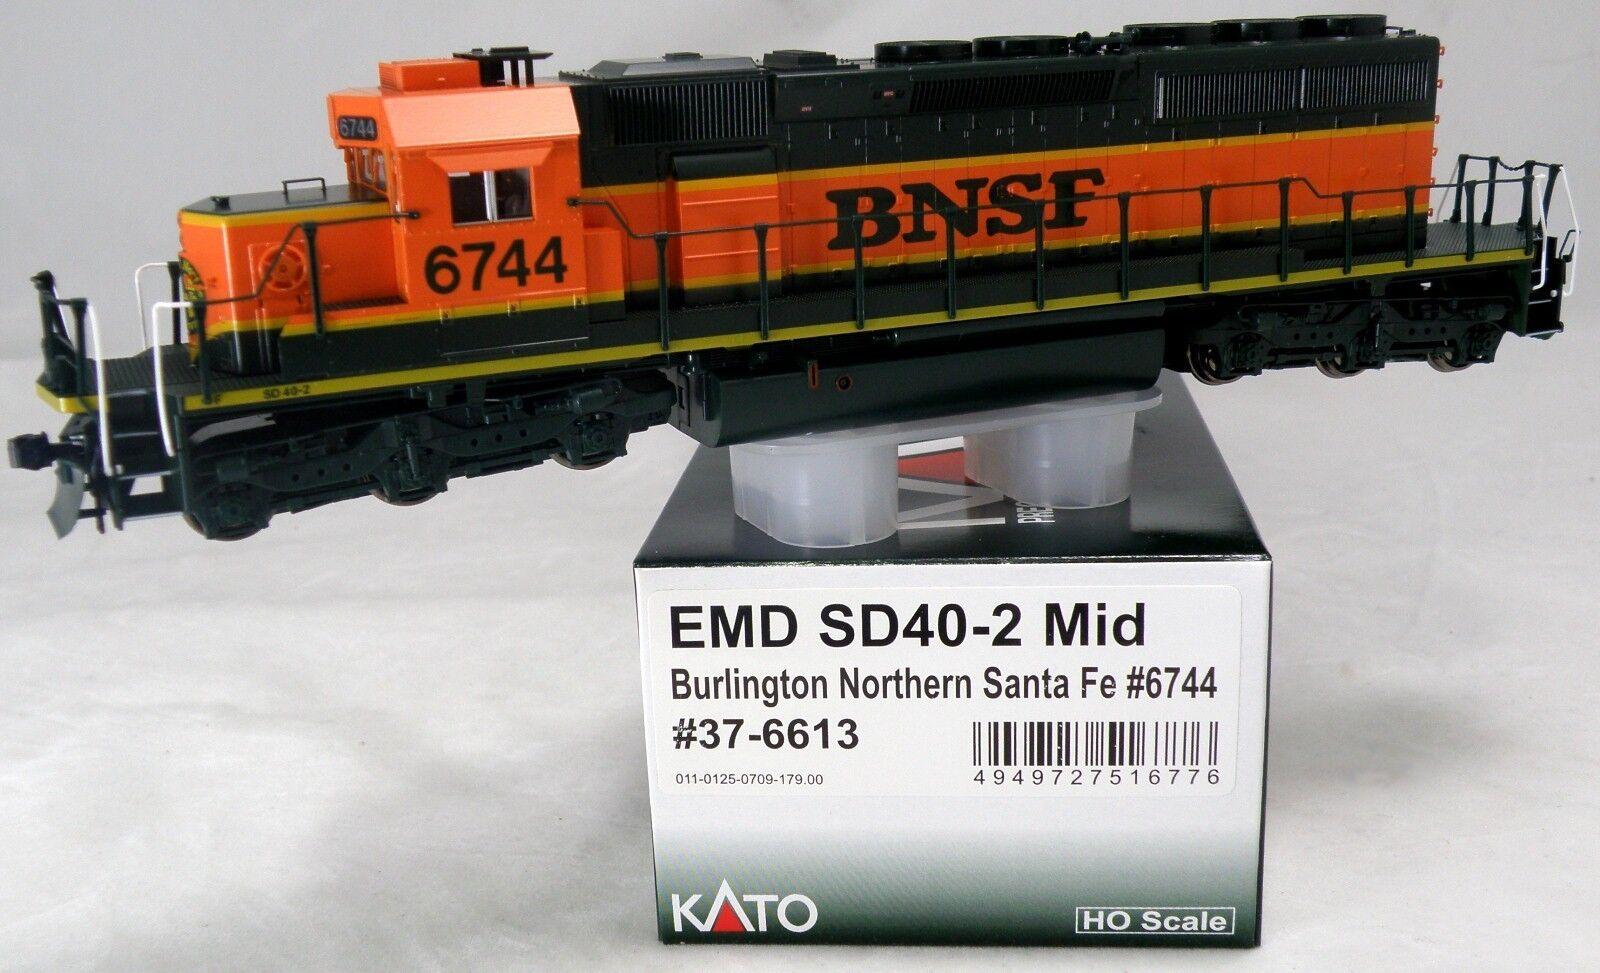 HO Scale EMD SD40-2 Mid Locomotive - BNSF (Heritage I) Kato